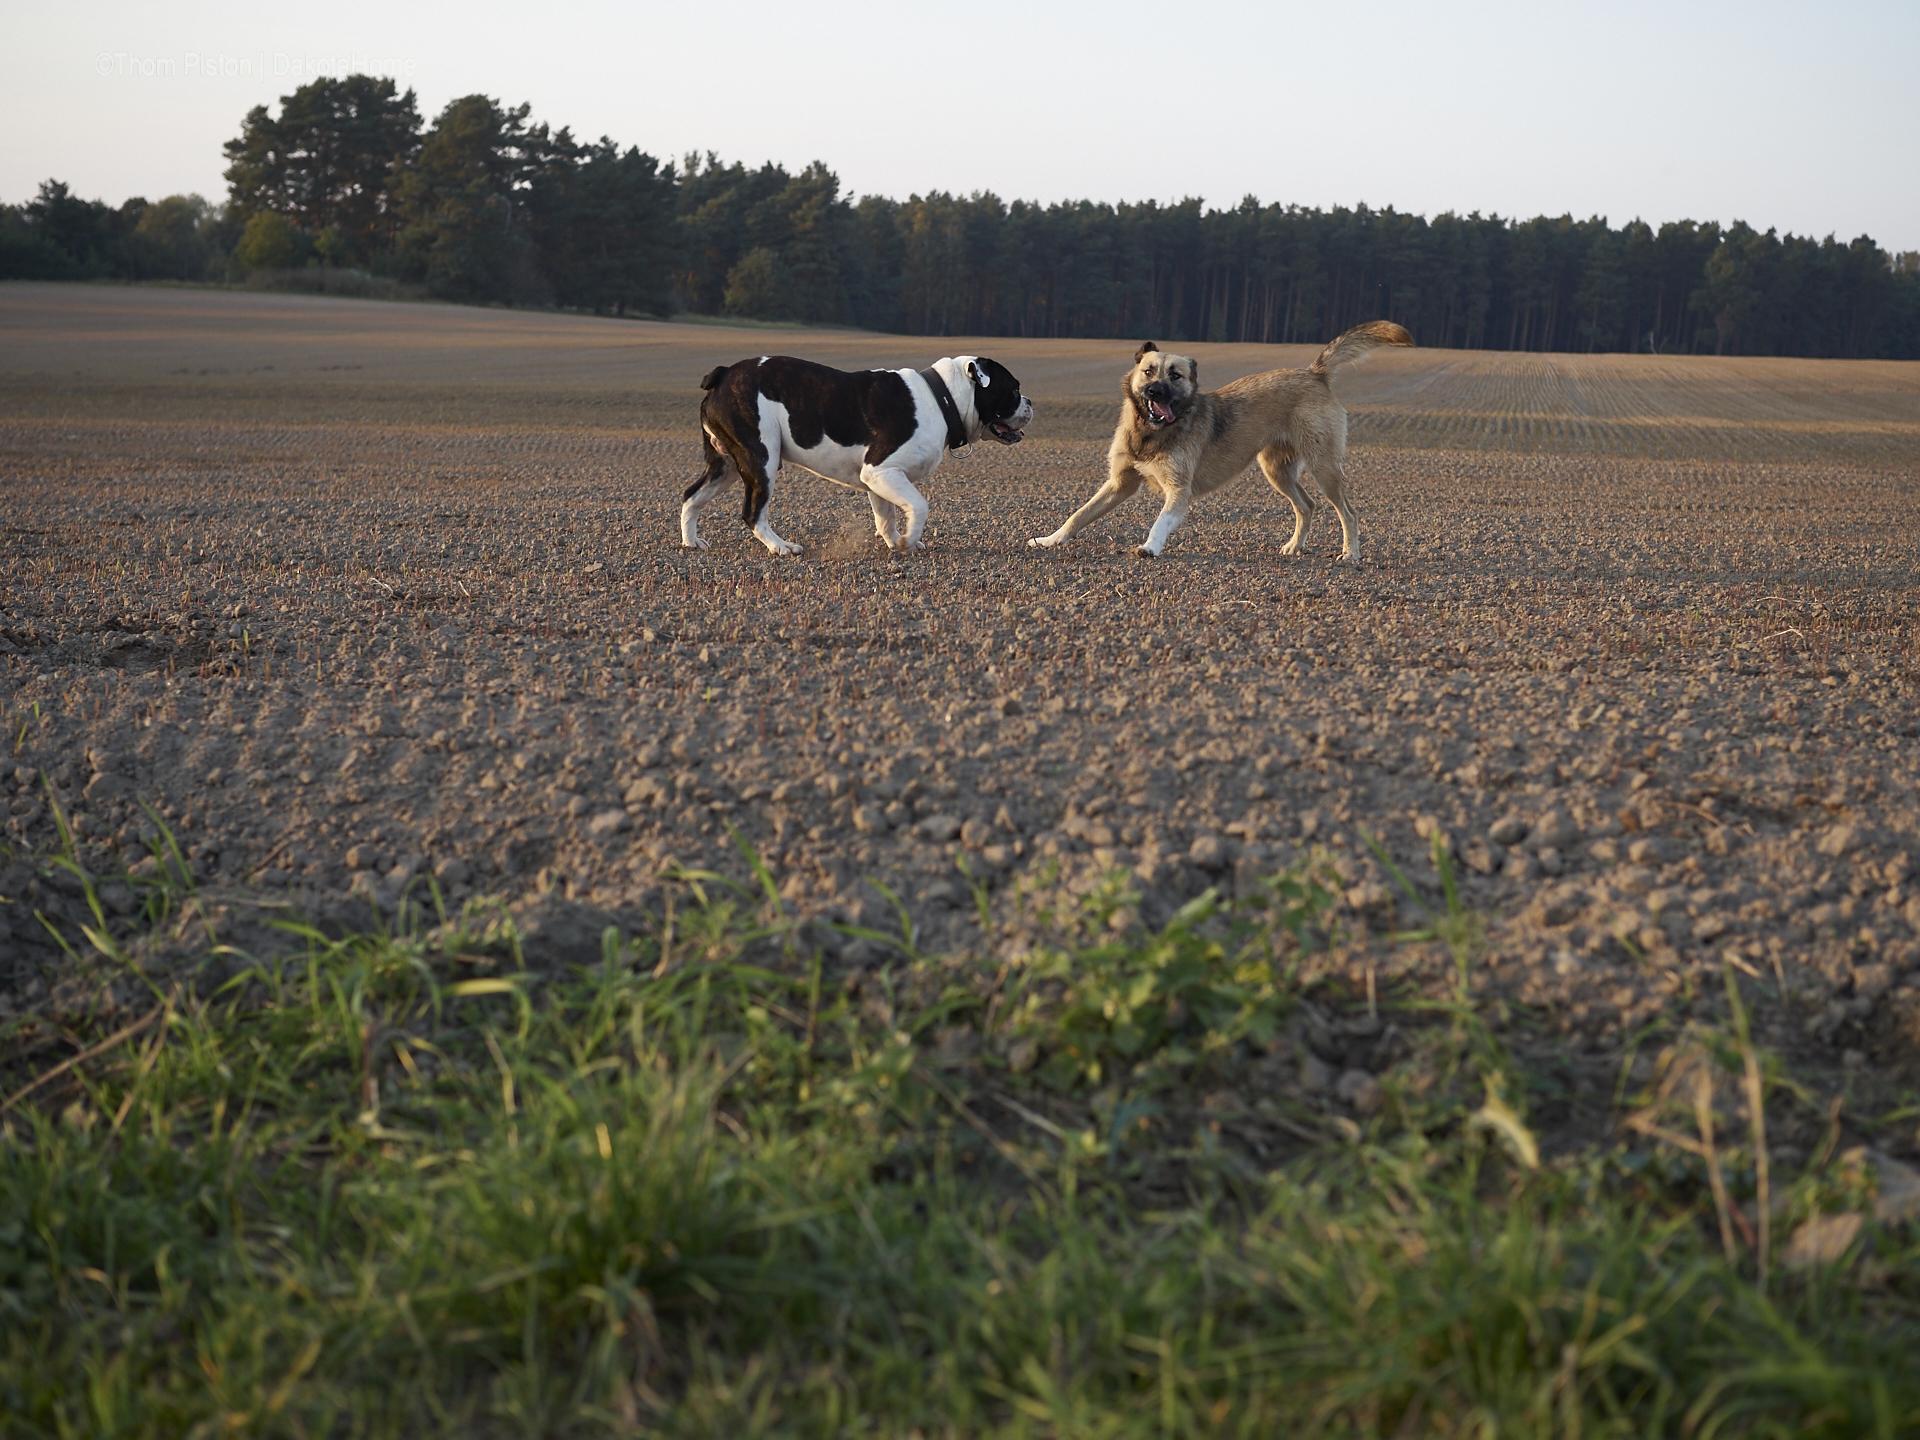 Pilze, Pool, Sonne, Kälte & die Bulldogge hat eine Herzdame